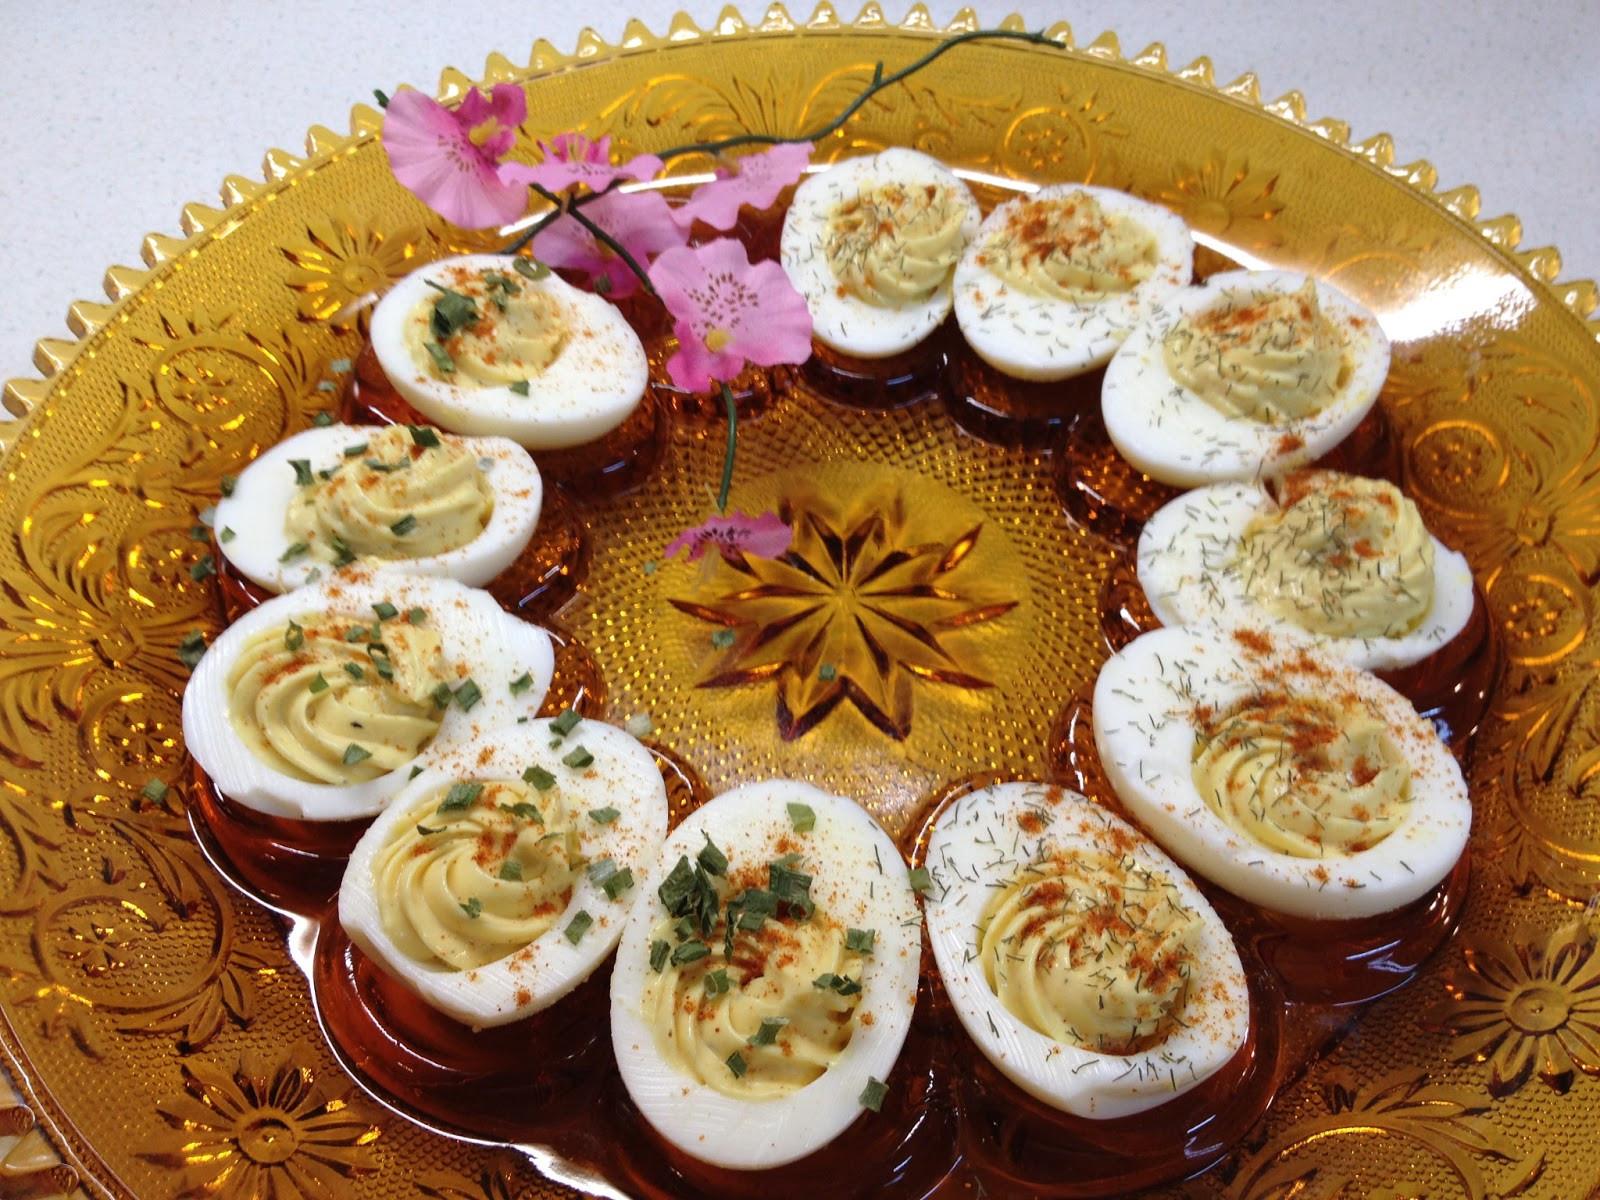 Low Fat Deviled Eggs  Cocina De Don Pedro Yummy Low Fat Deviled Eggs